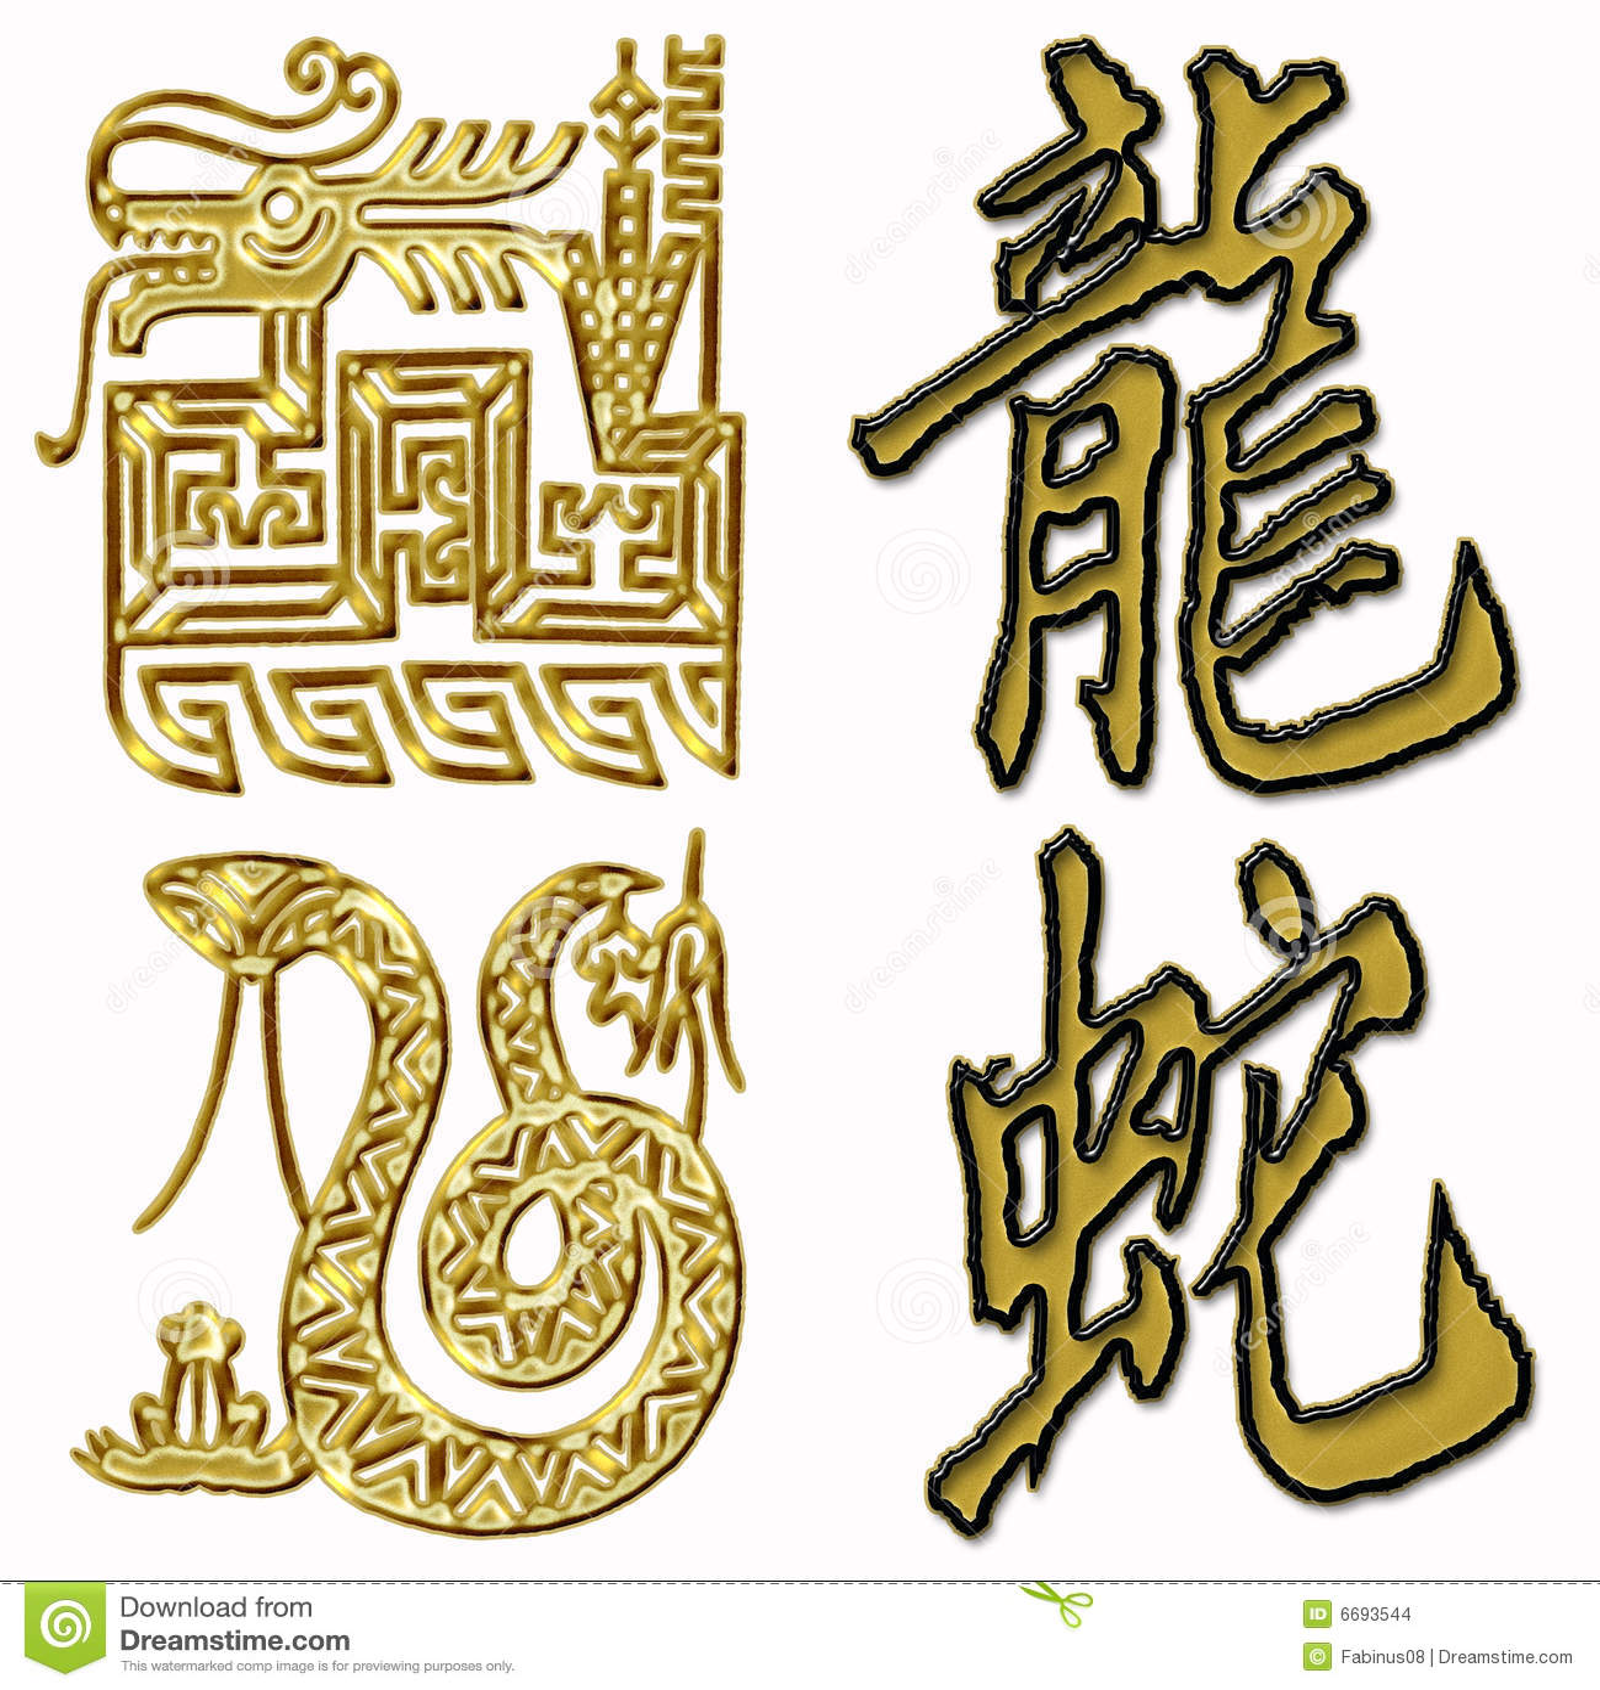 Dream dictionary chinese man goto horoscope 4577637 seafoodnetfo dream dictionary chinese man goto horoscope biocorpaavc